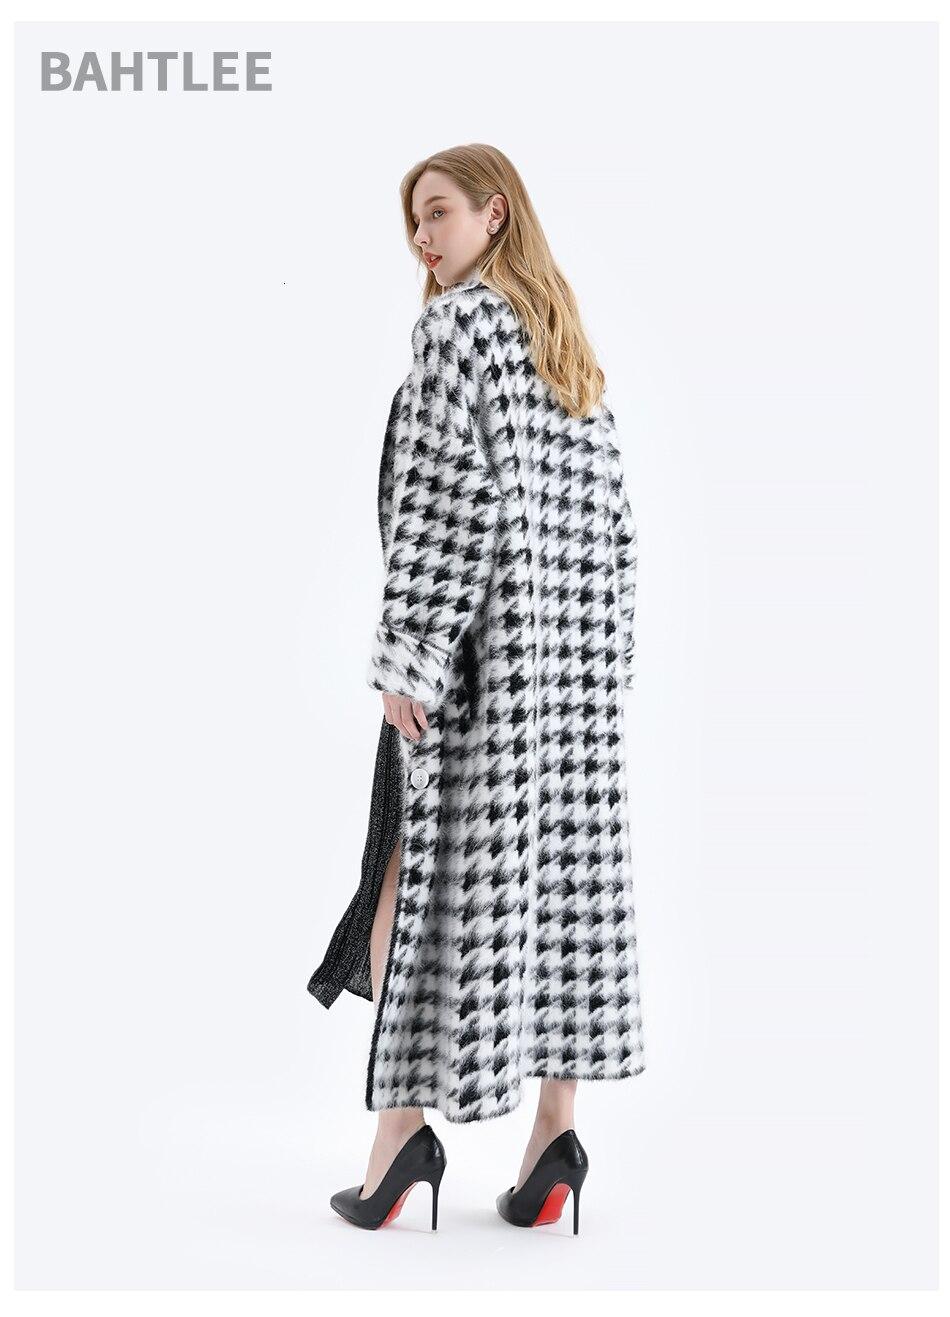 BAHTLEE Women Angora Long Coat Houndstooth Pattern Sweater Winter Wool Knitted Cardigans Jumper Turn Down Collar Long Sleeves 8